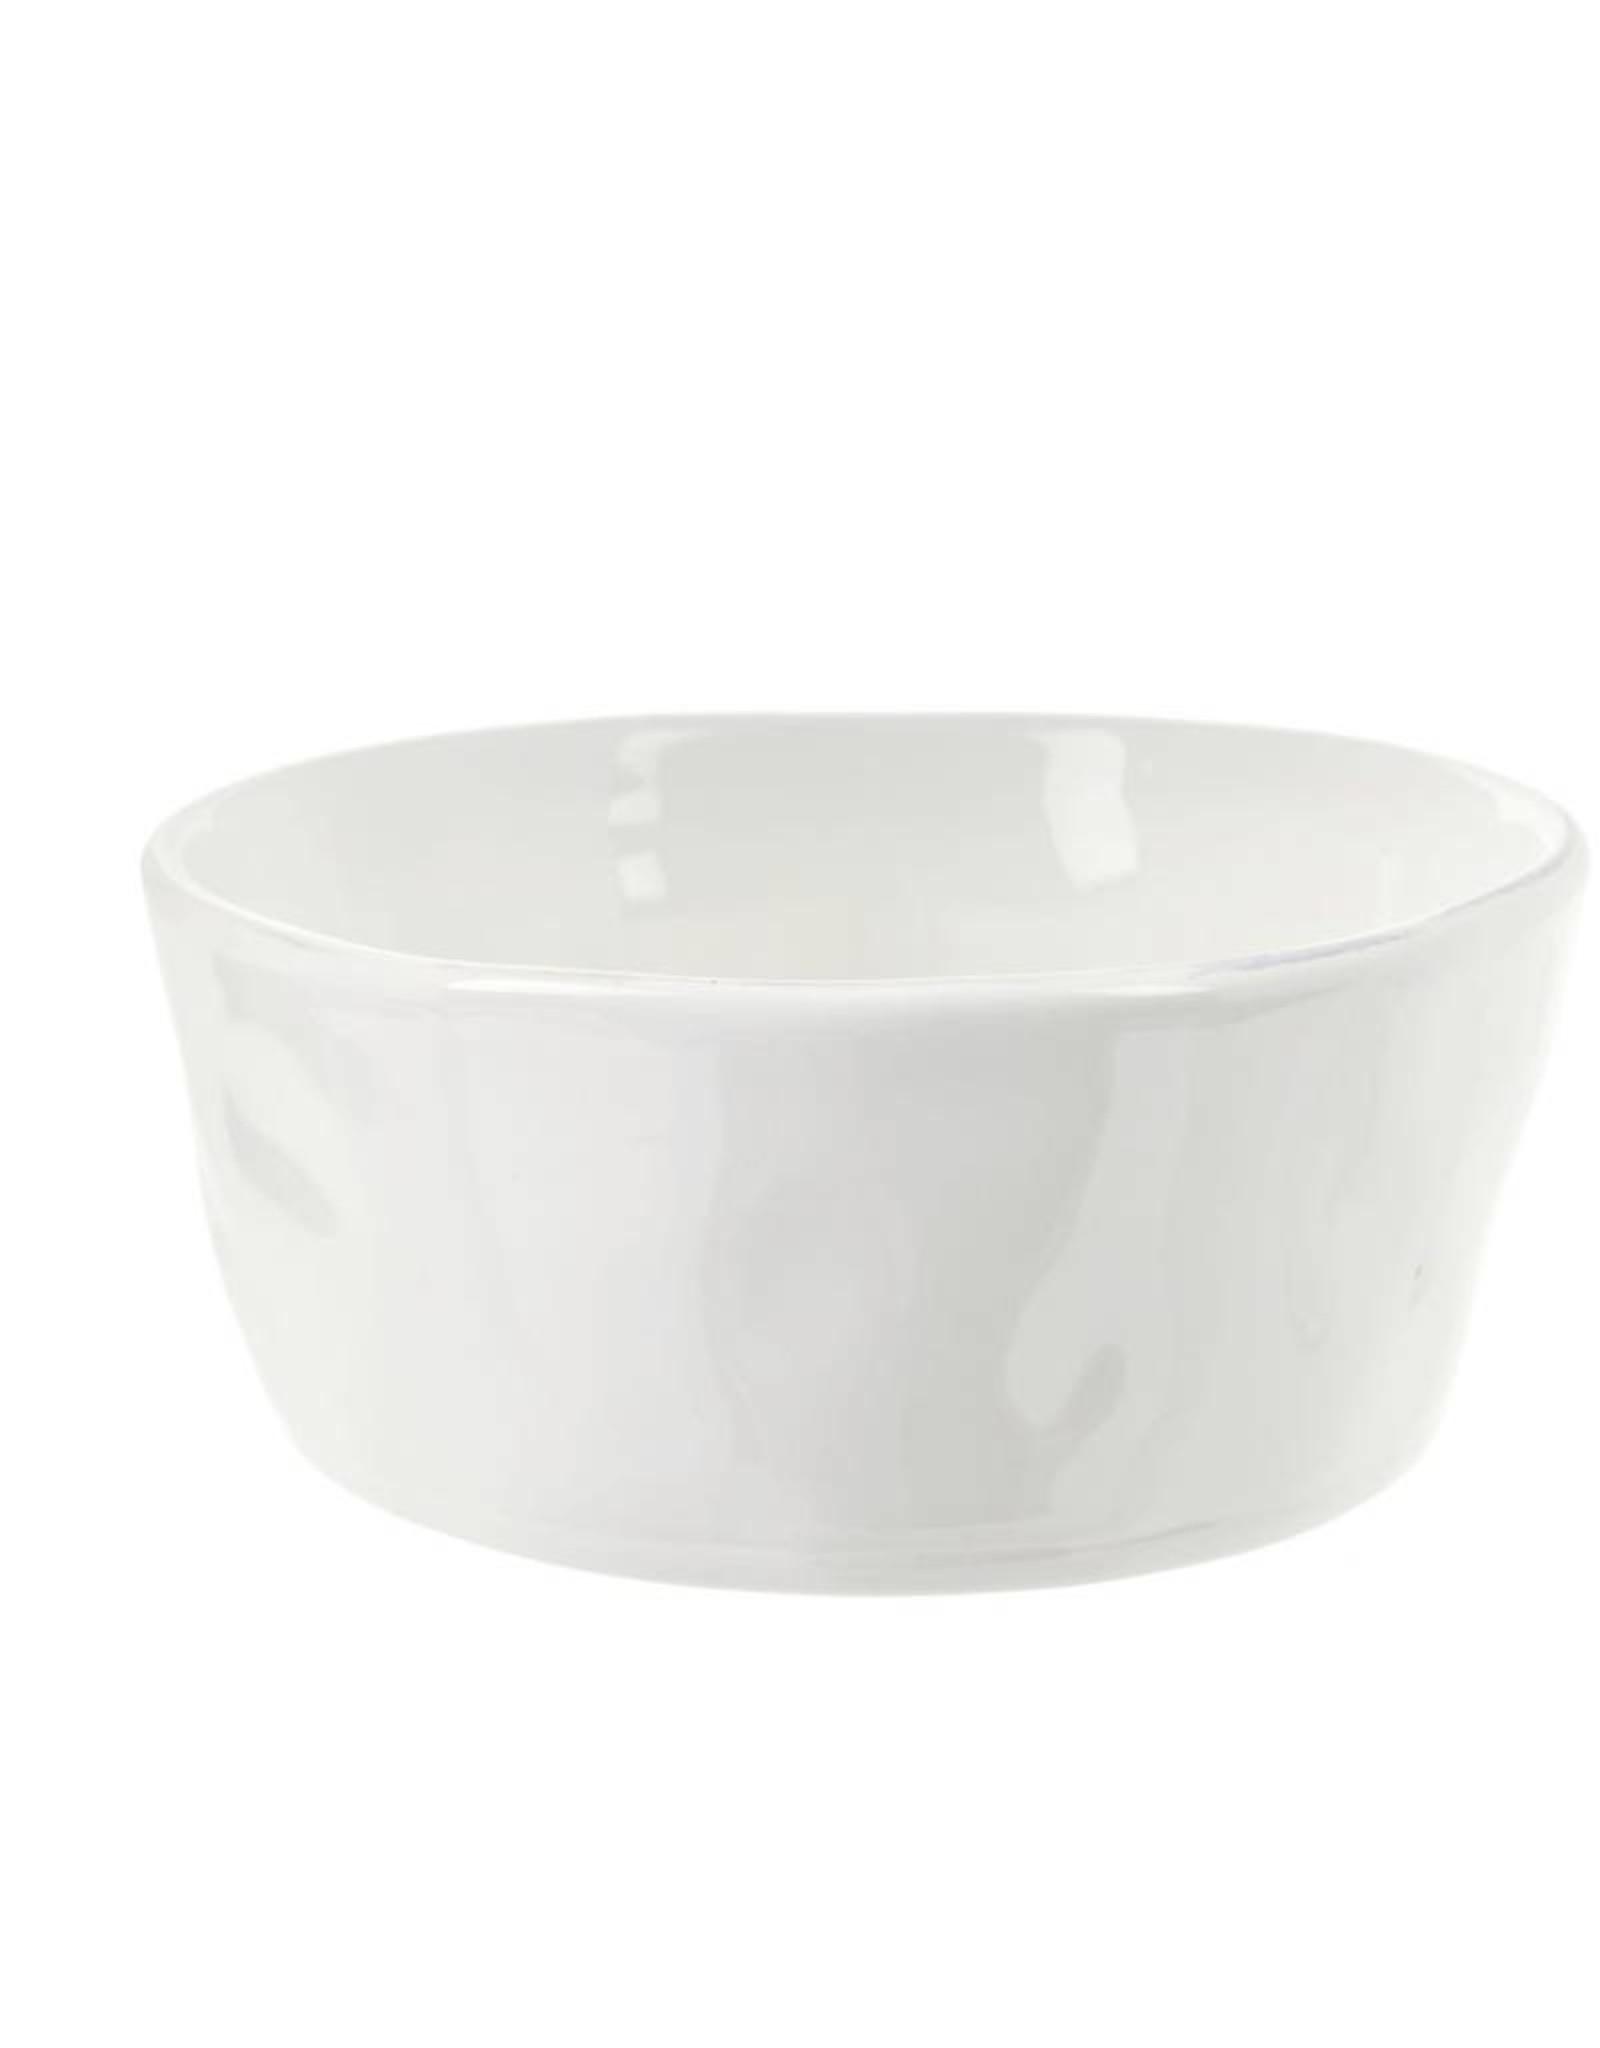 Ceres Bowl